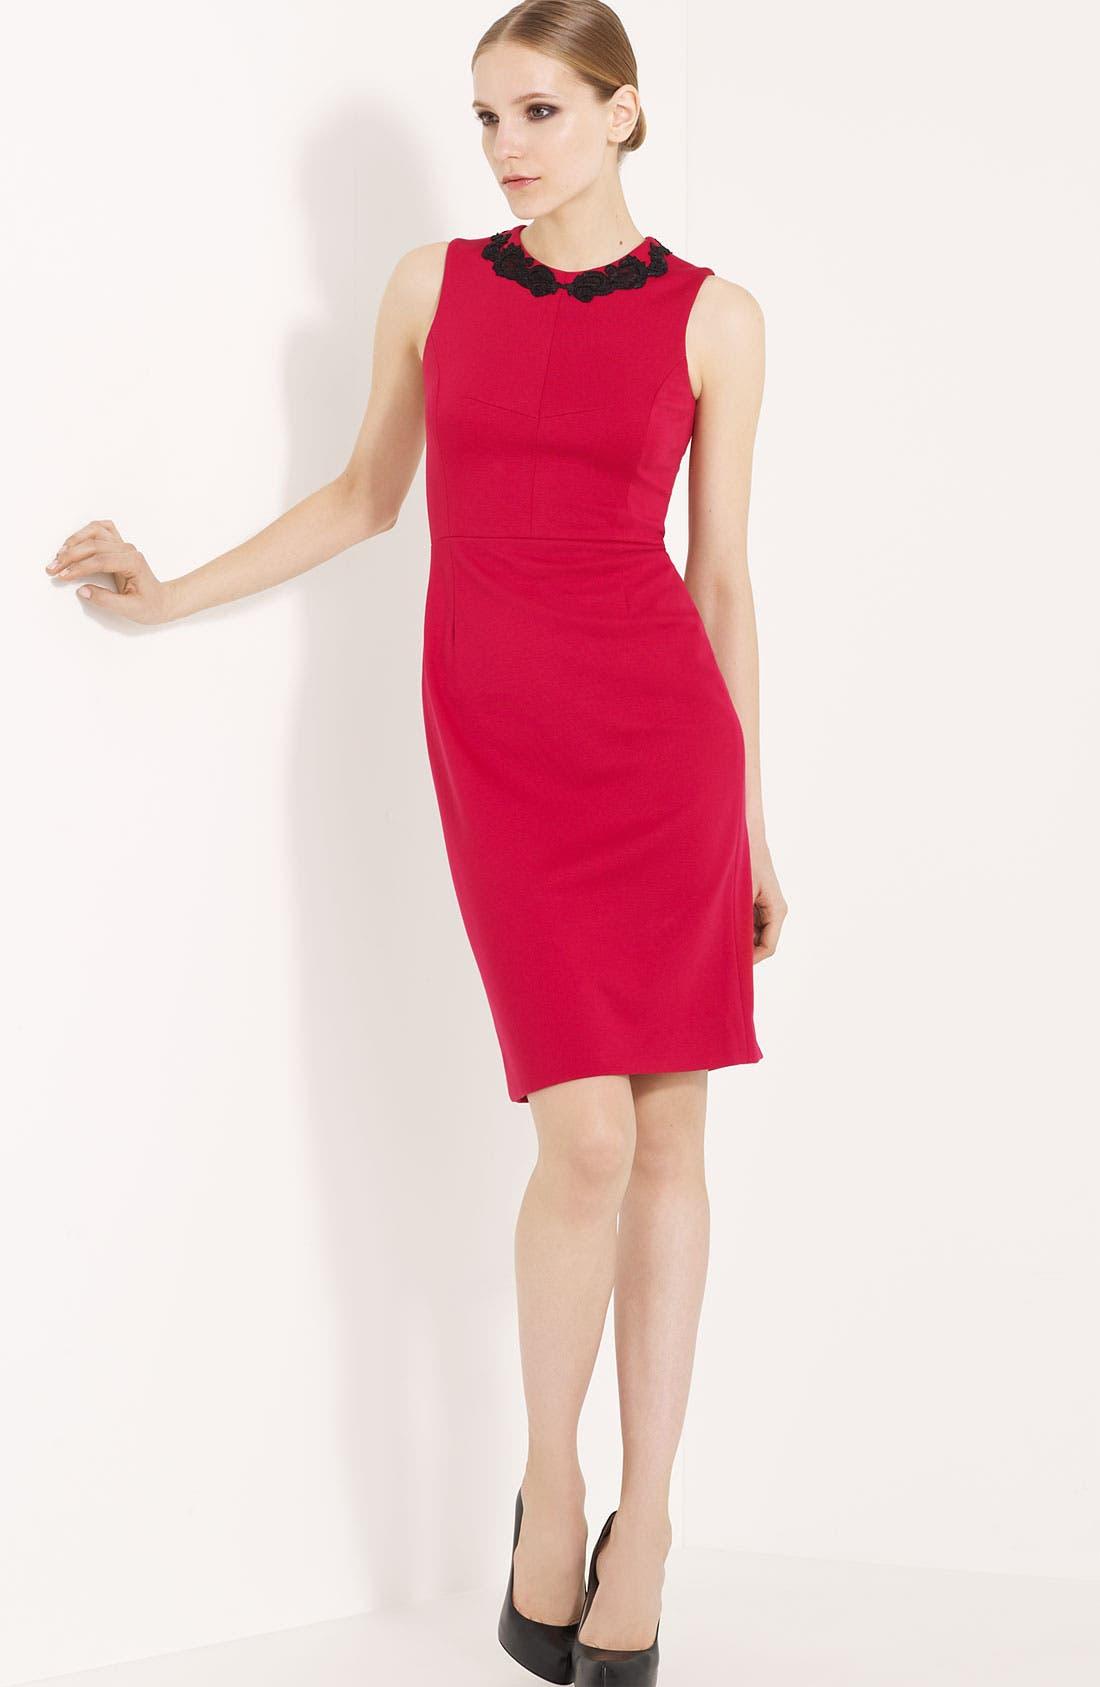 Alternate Image 1 Selected - Jason Wu Embroidered Jersey Dress